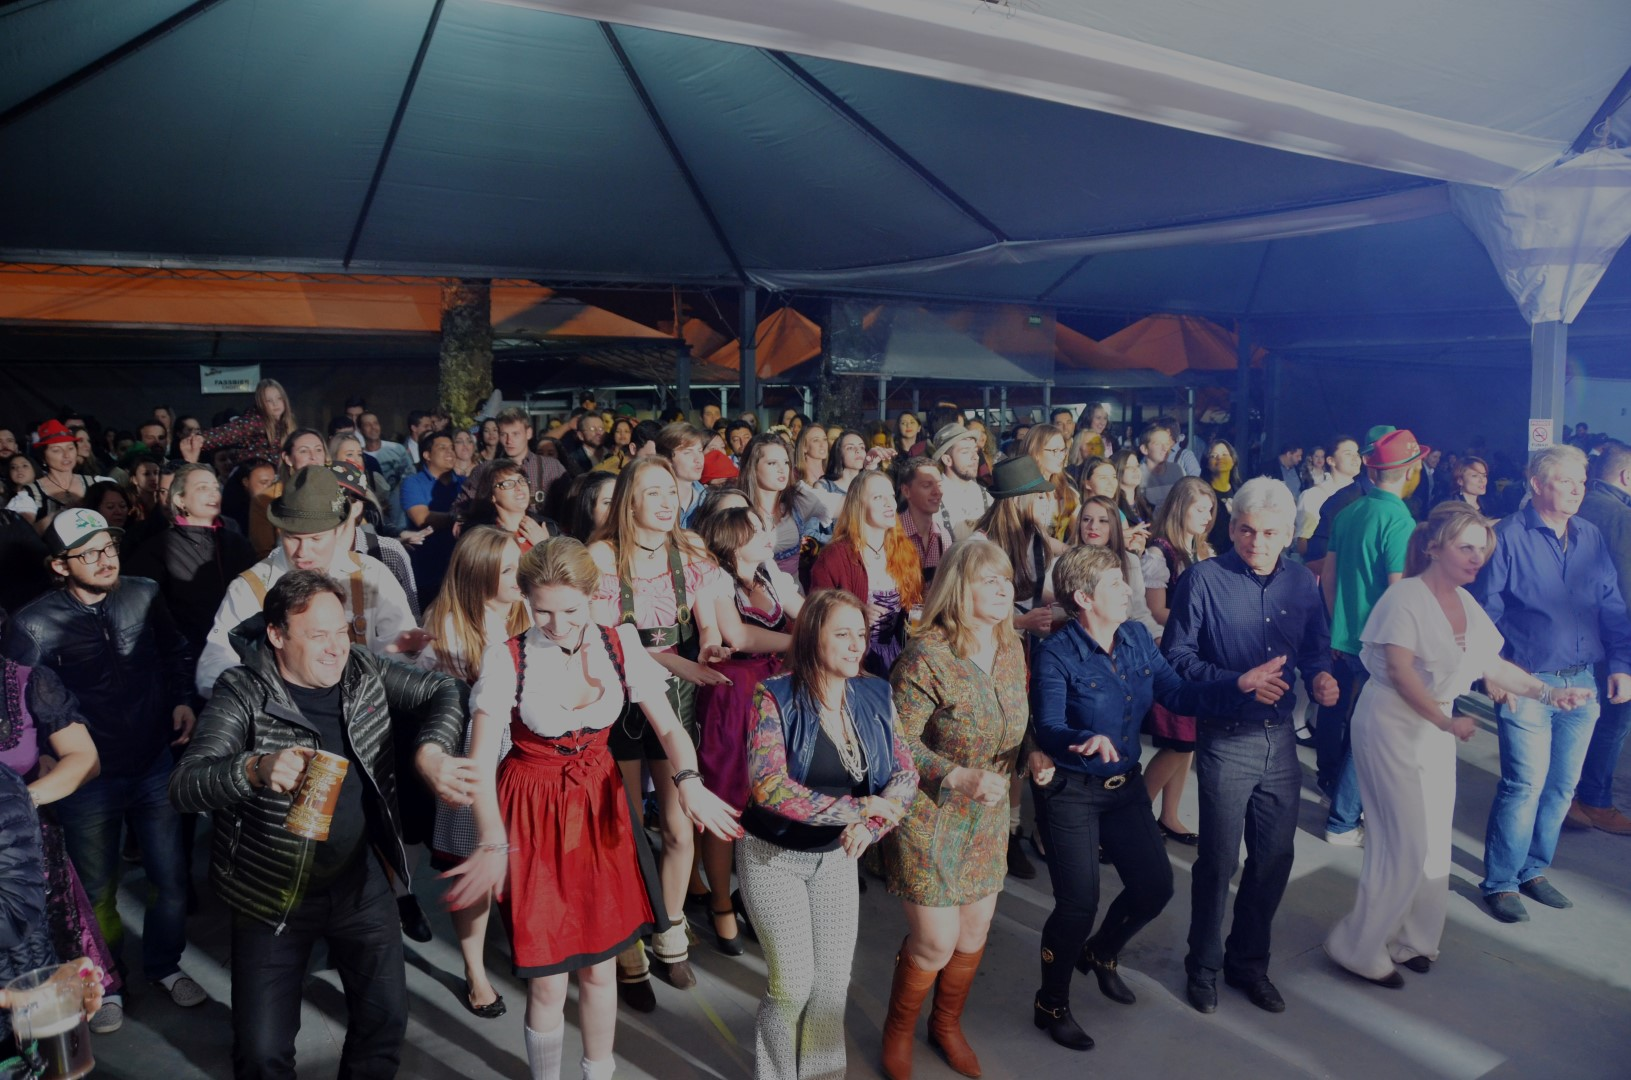 Oktoberfest 2016 - 10/09/2016Oktoberfest 2016 - 10/09/2016